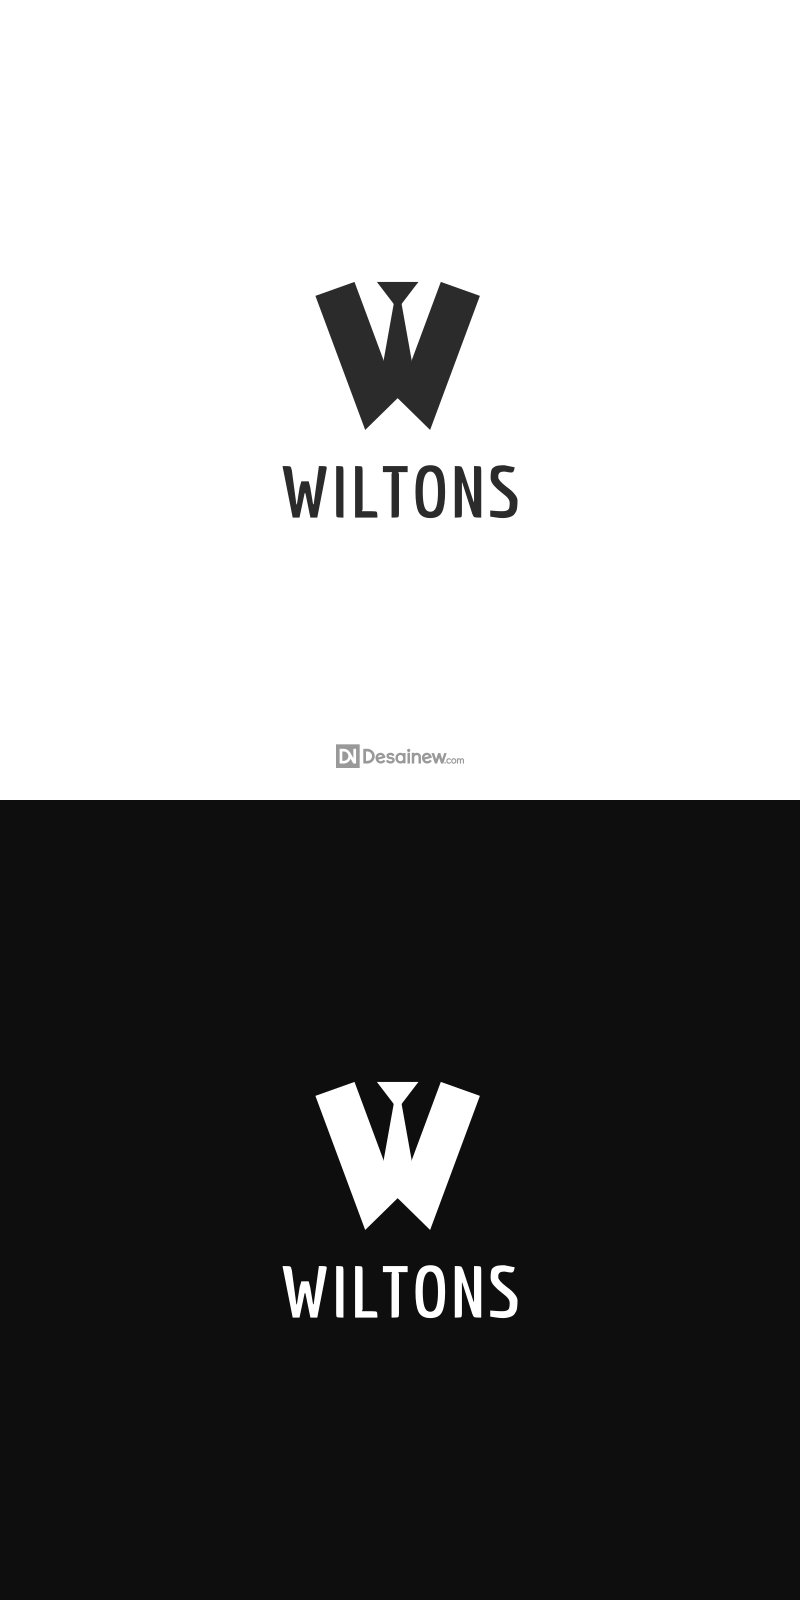 Wiltons Logo Design Project Portfolio Desainew Studio